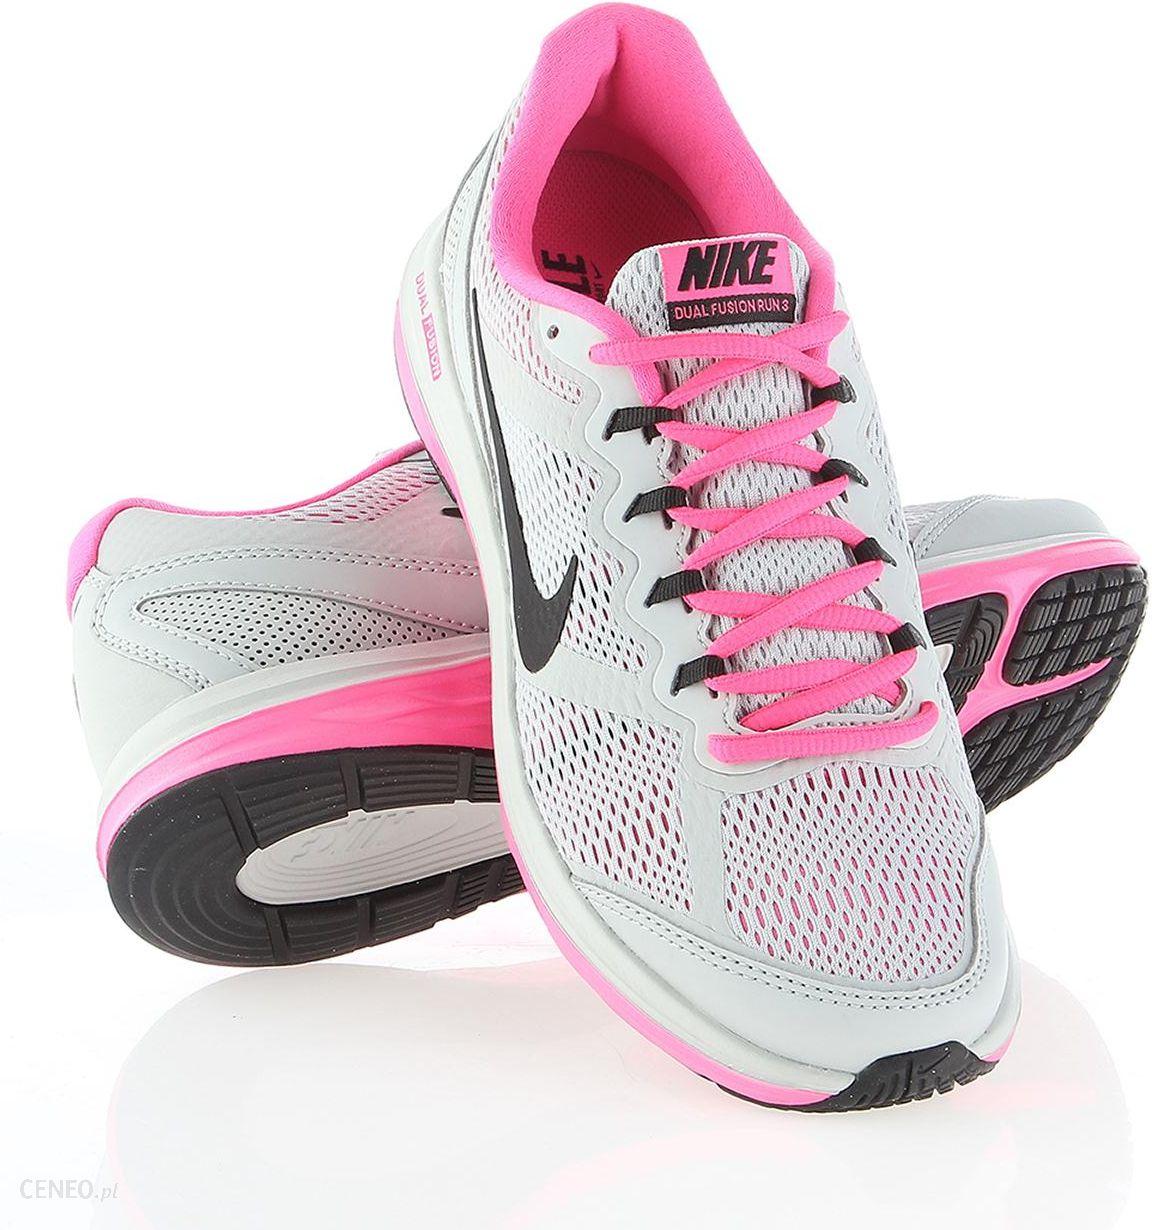 Nike Dual Fusion Run 3 MSL 654446-012 - Ceny i opinie - Ceneo.pl 7f424020ef4fa